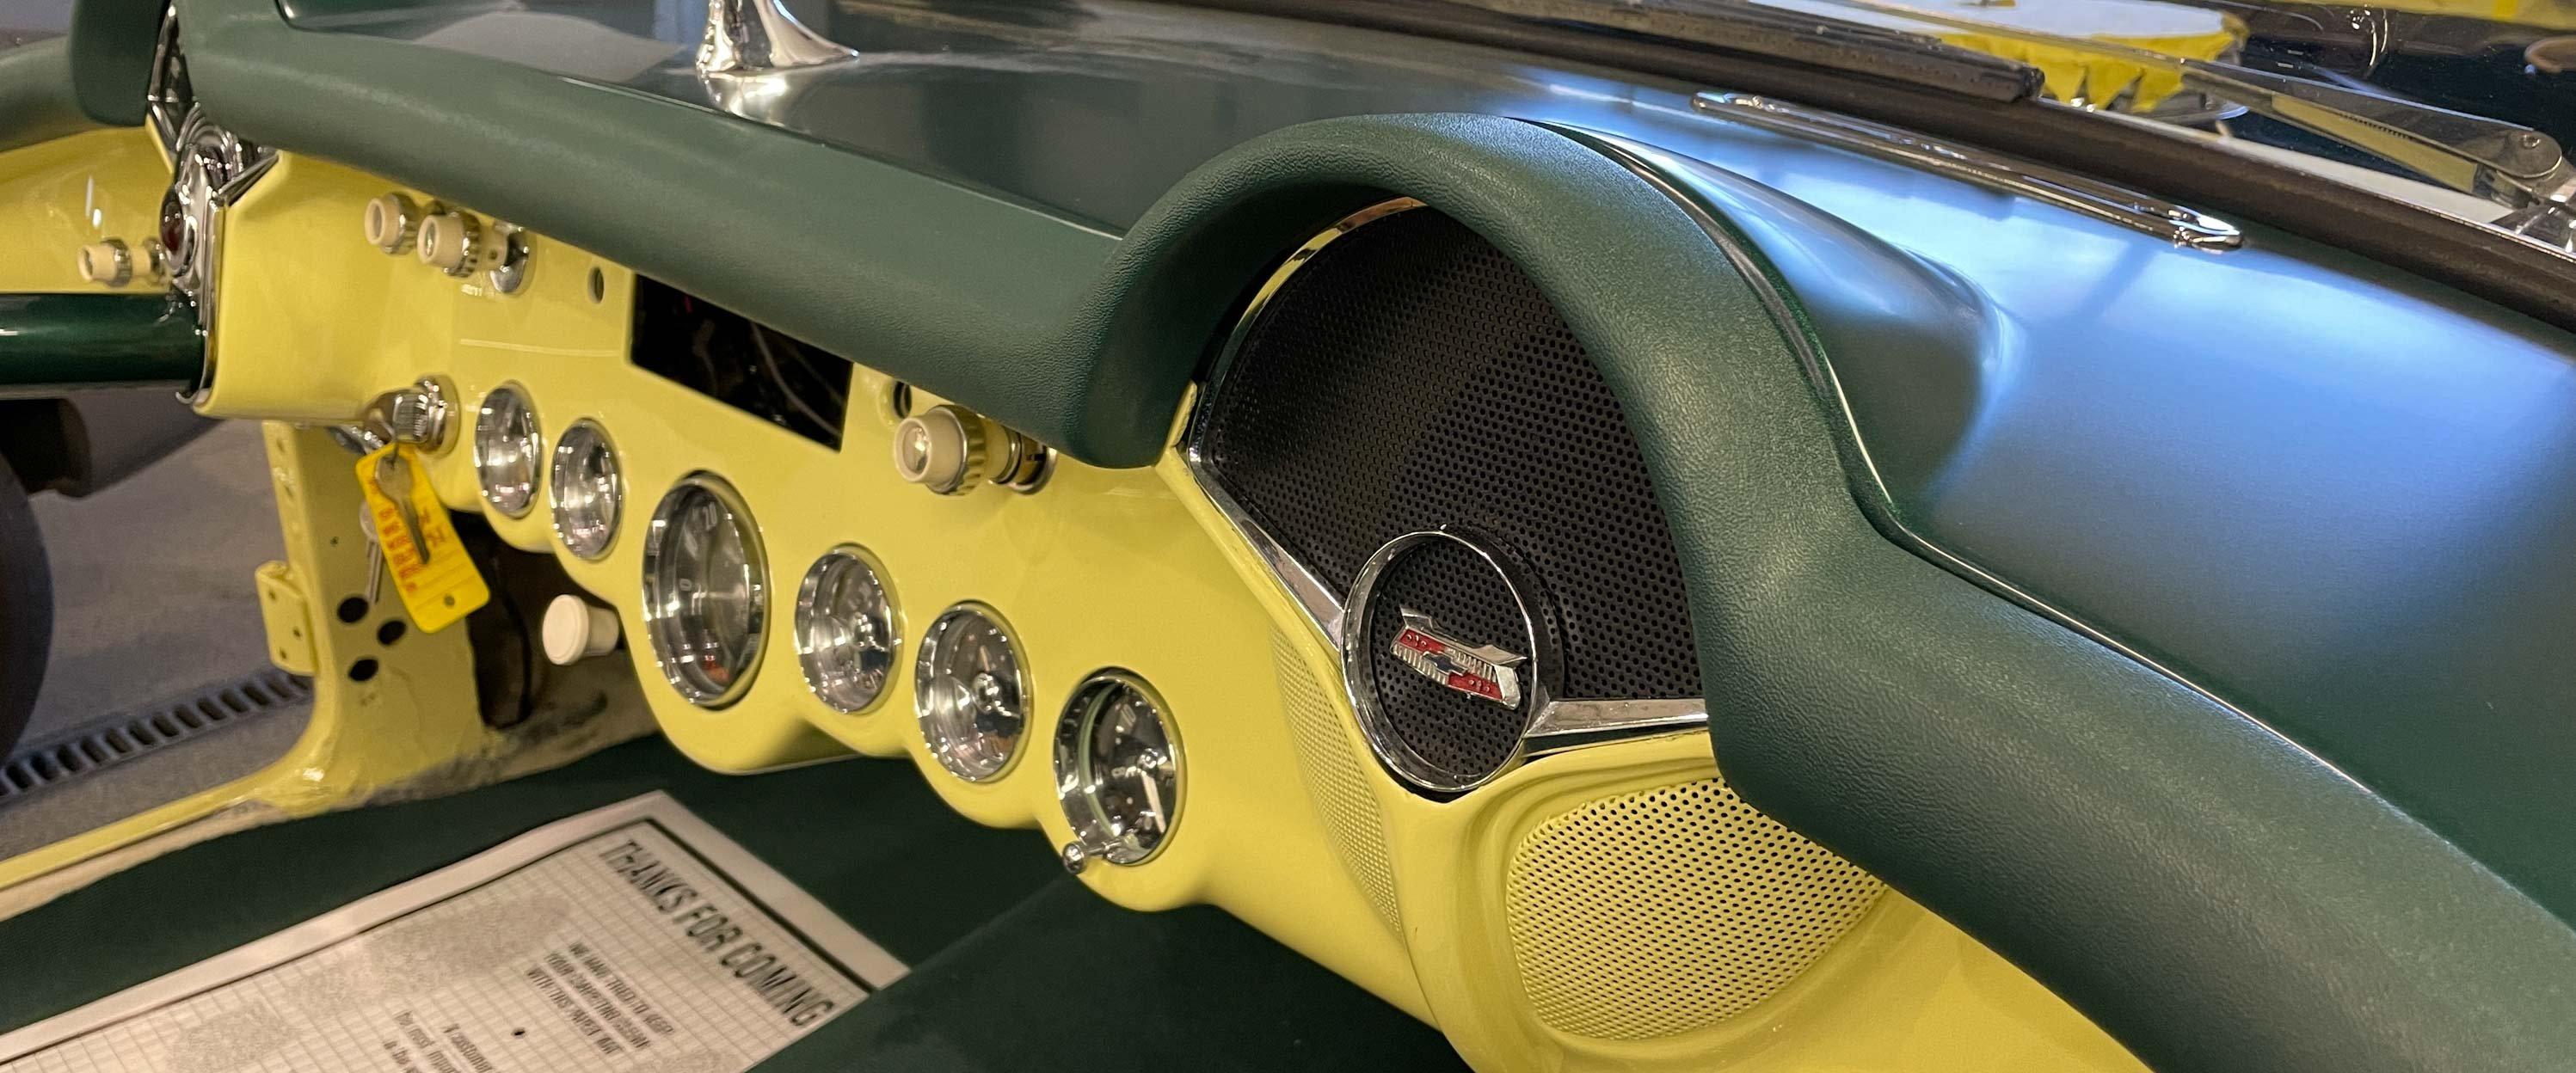 1955-Chevrolet-Corvette-Roadster-Yellow-slideshow-067@2x